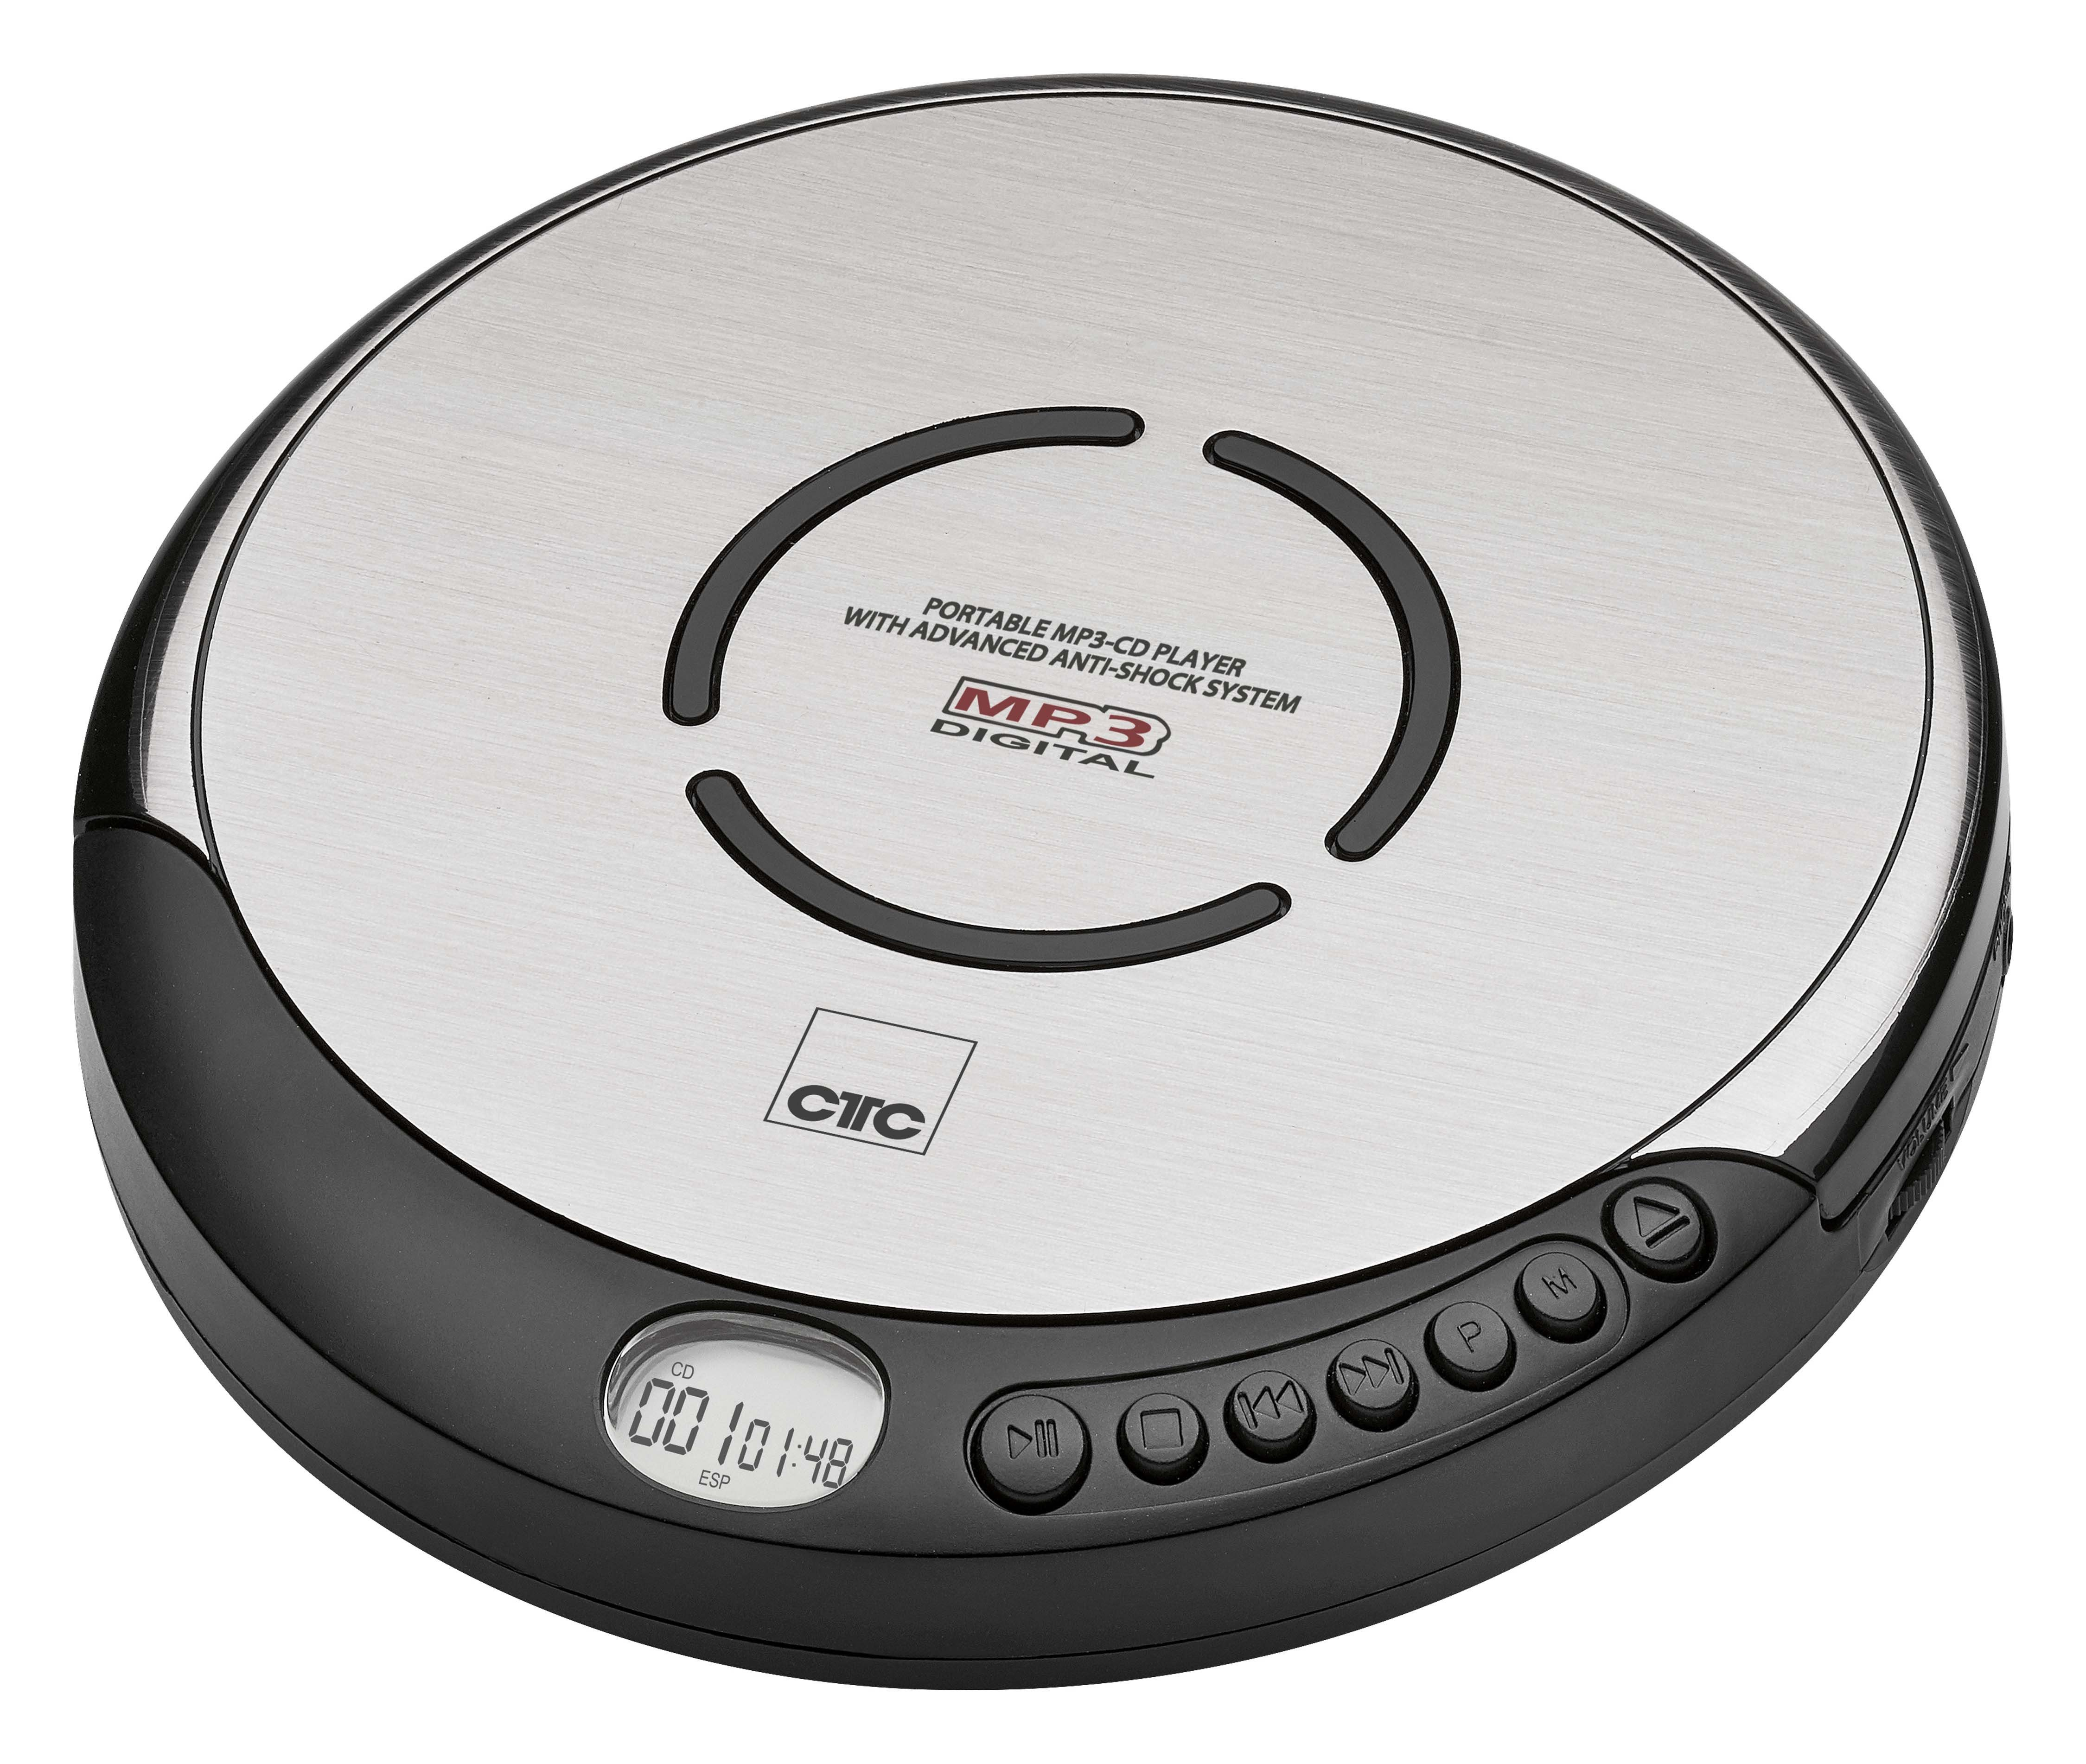 CTC Tragbarer CD-Player inkl. In-Ear-Kopfhörer und LCD-Display »CDP 7001«